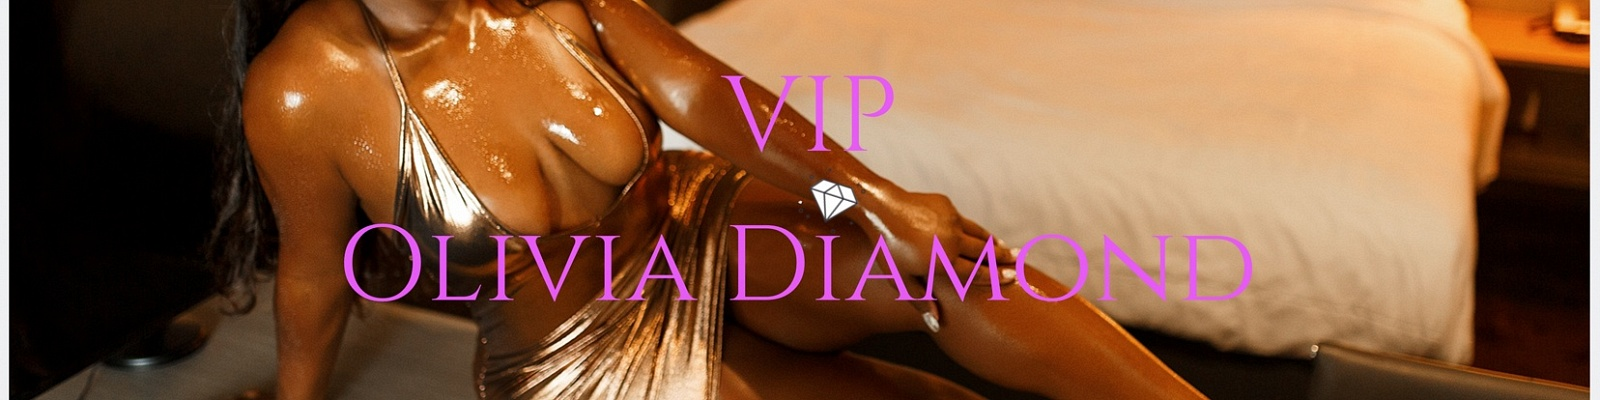 VIP Olivia Diamond's Cover Photo